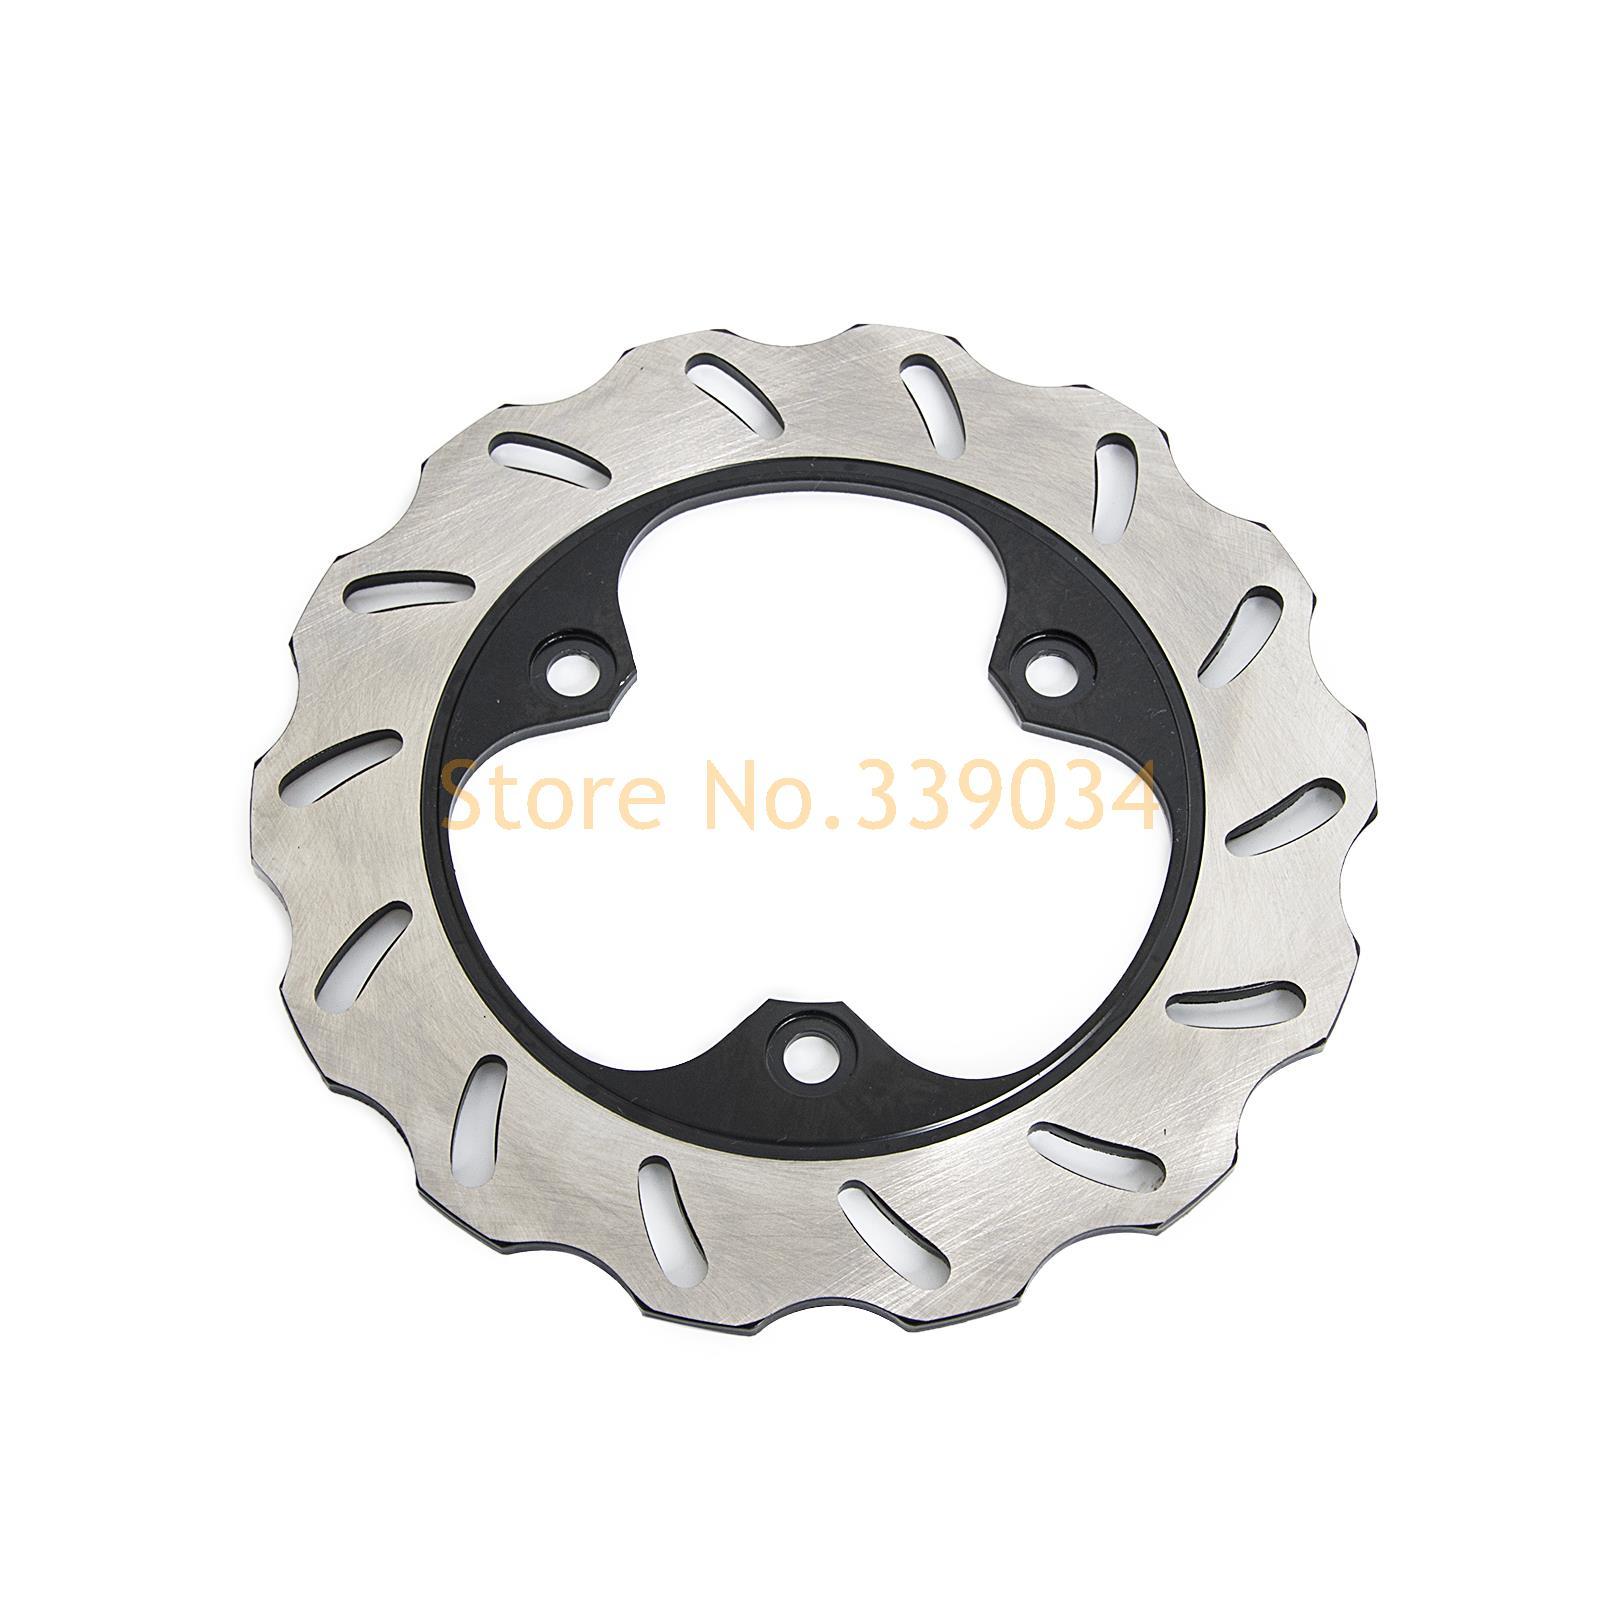 ФОТО Motorcycle Steel Rear Brake Disc For Honda CBR 250 RH (MC17) 87